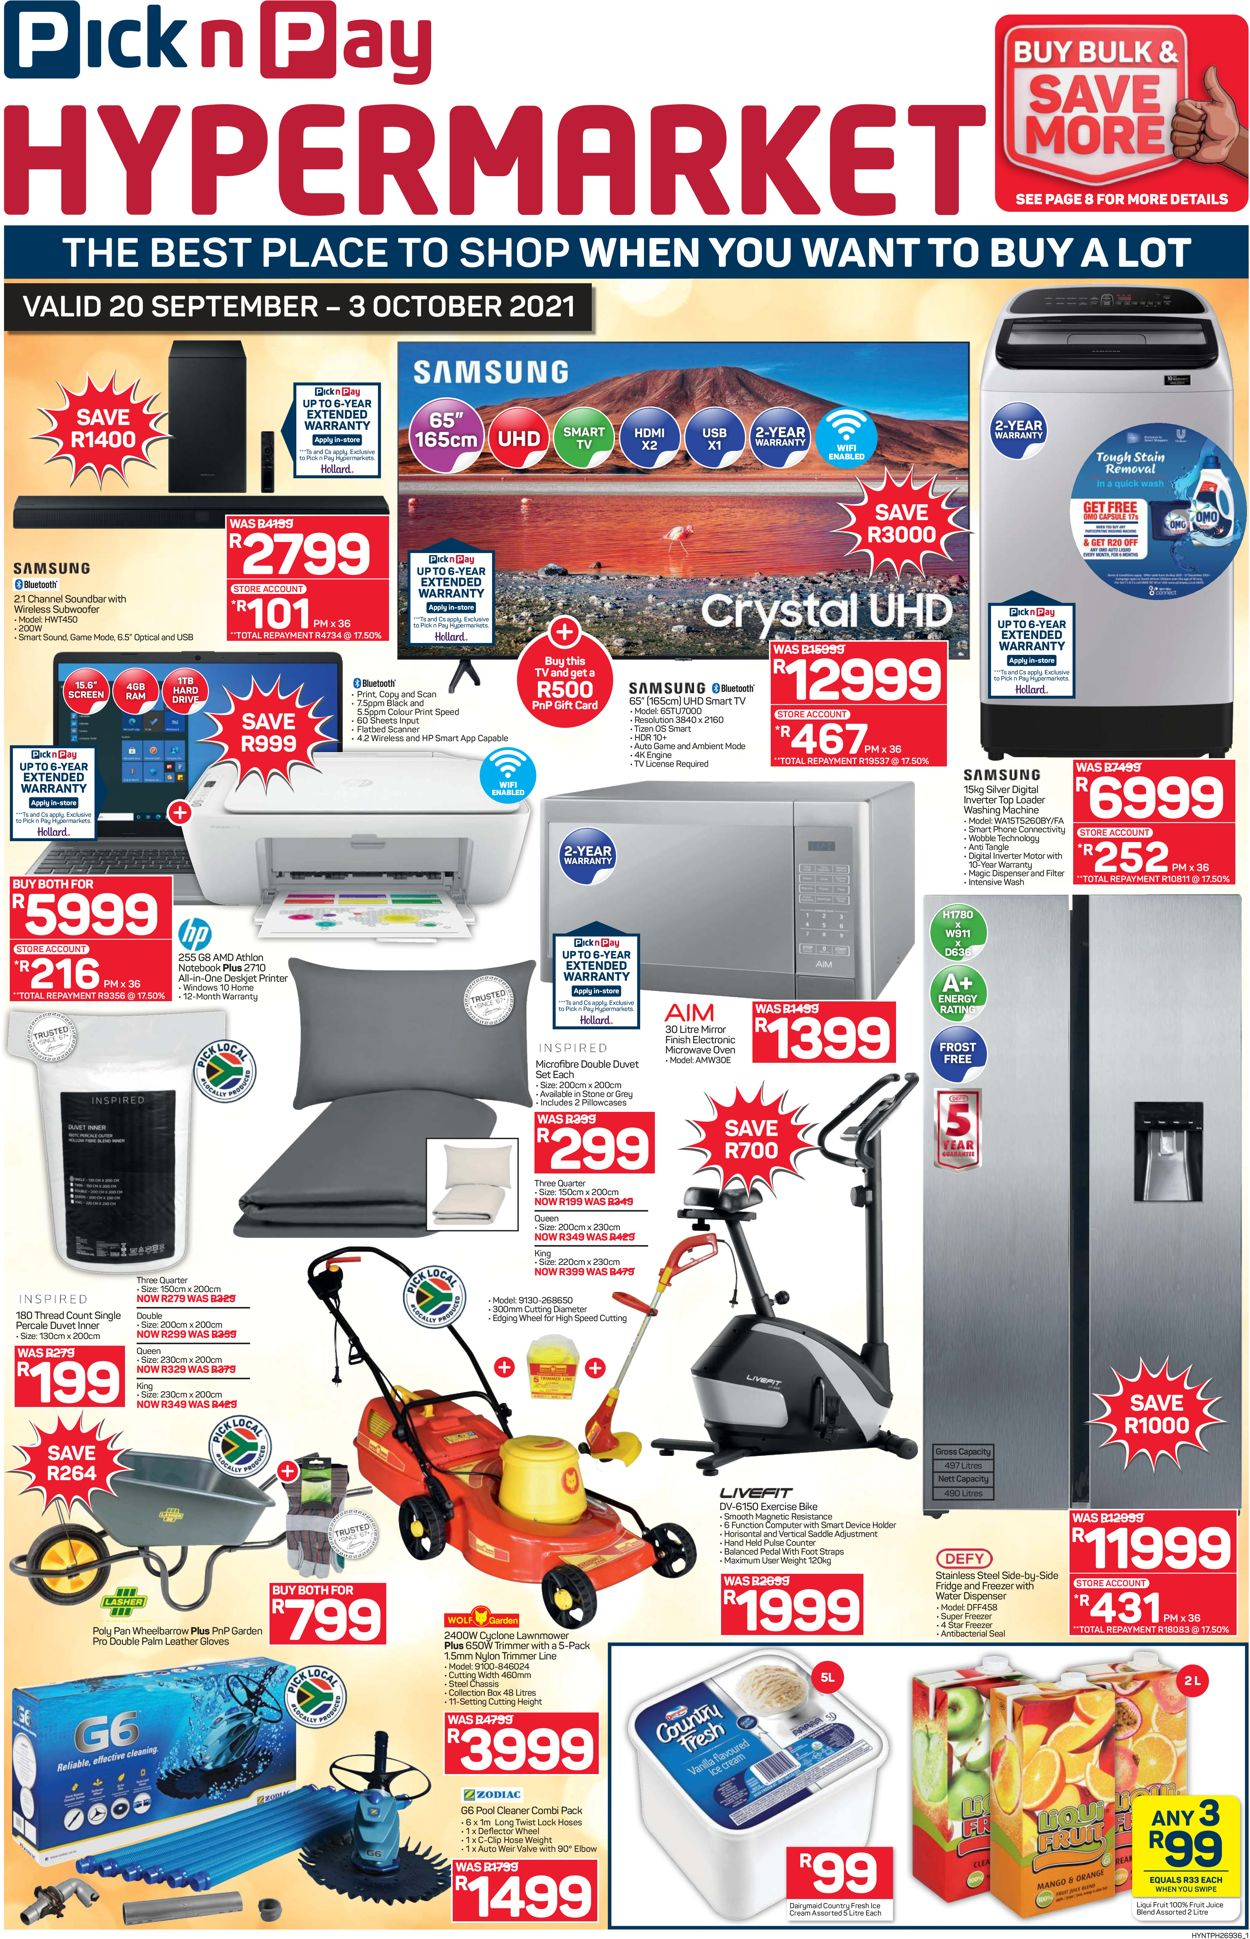 Pick n Pay Catalogue - 2021/09/20-2021/10/03